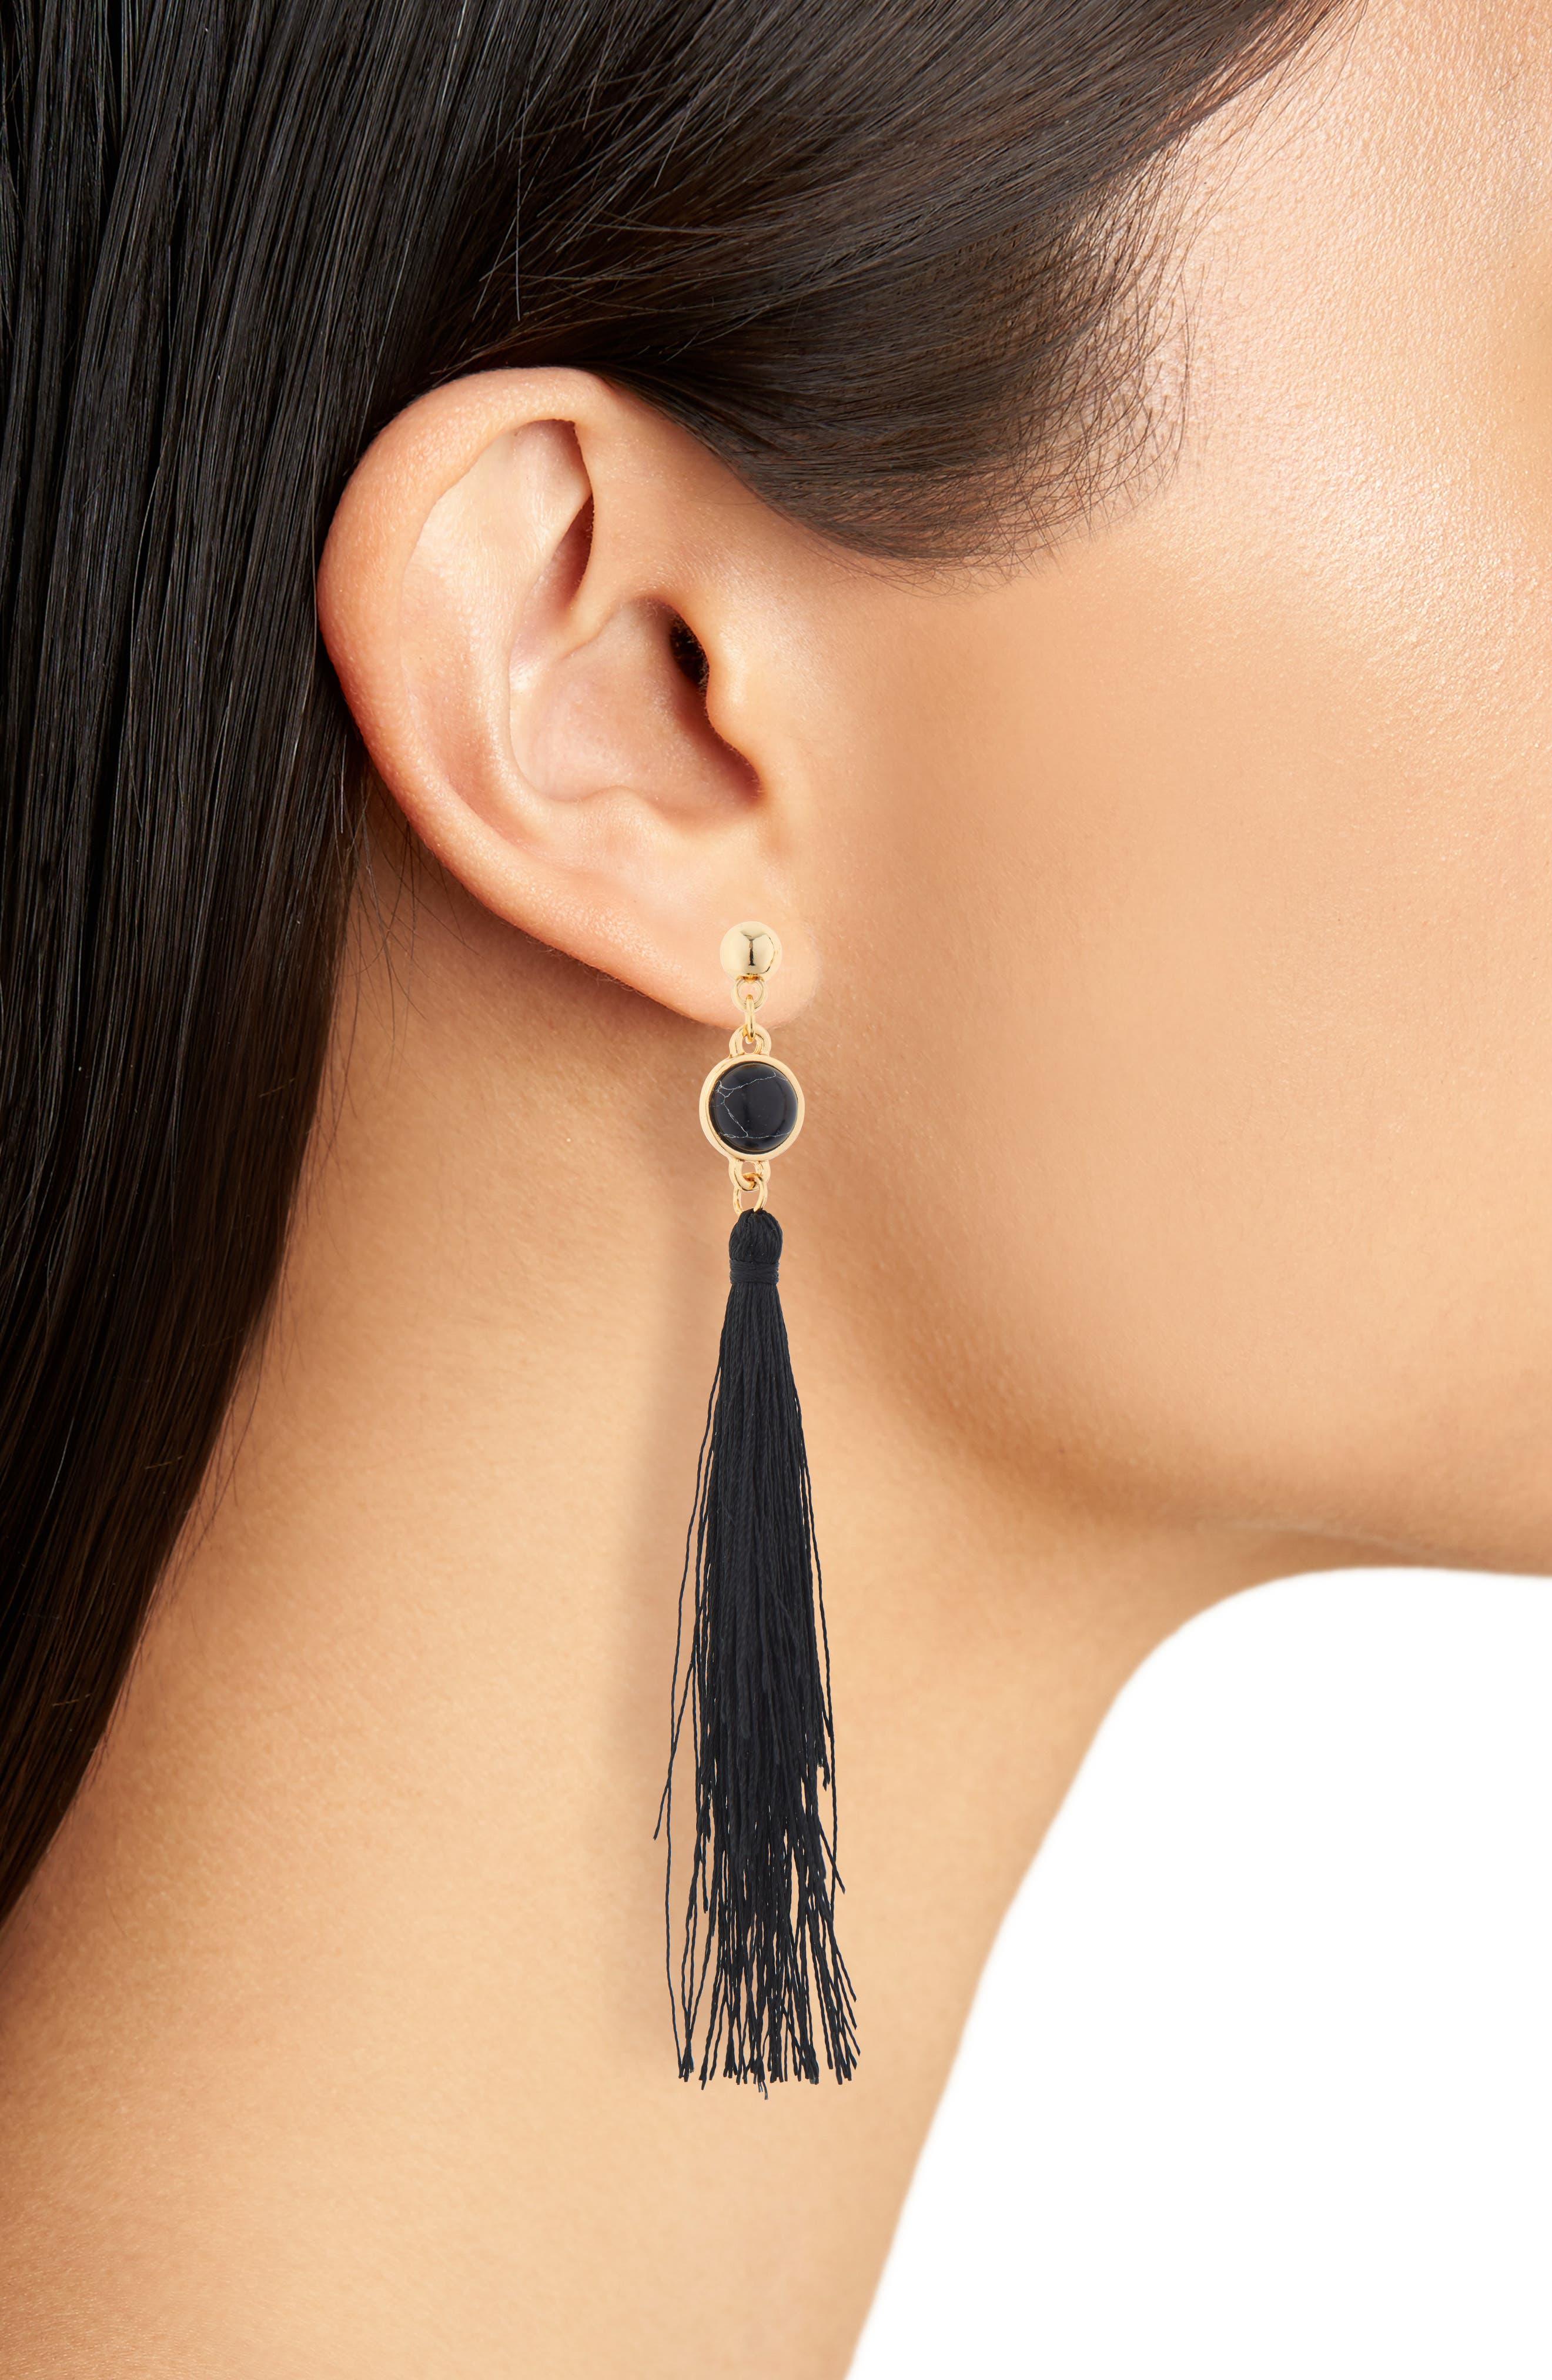 UNCOMMON JAMES BY KRISTIN CAVALLARI, Strawberry Fields Jasper Tassel Earrings, Alternate thumbnail 2, color, BLACK